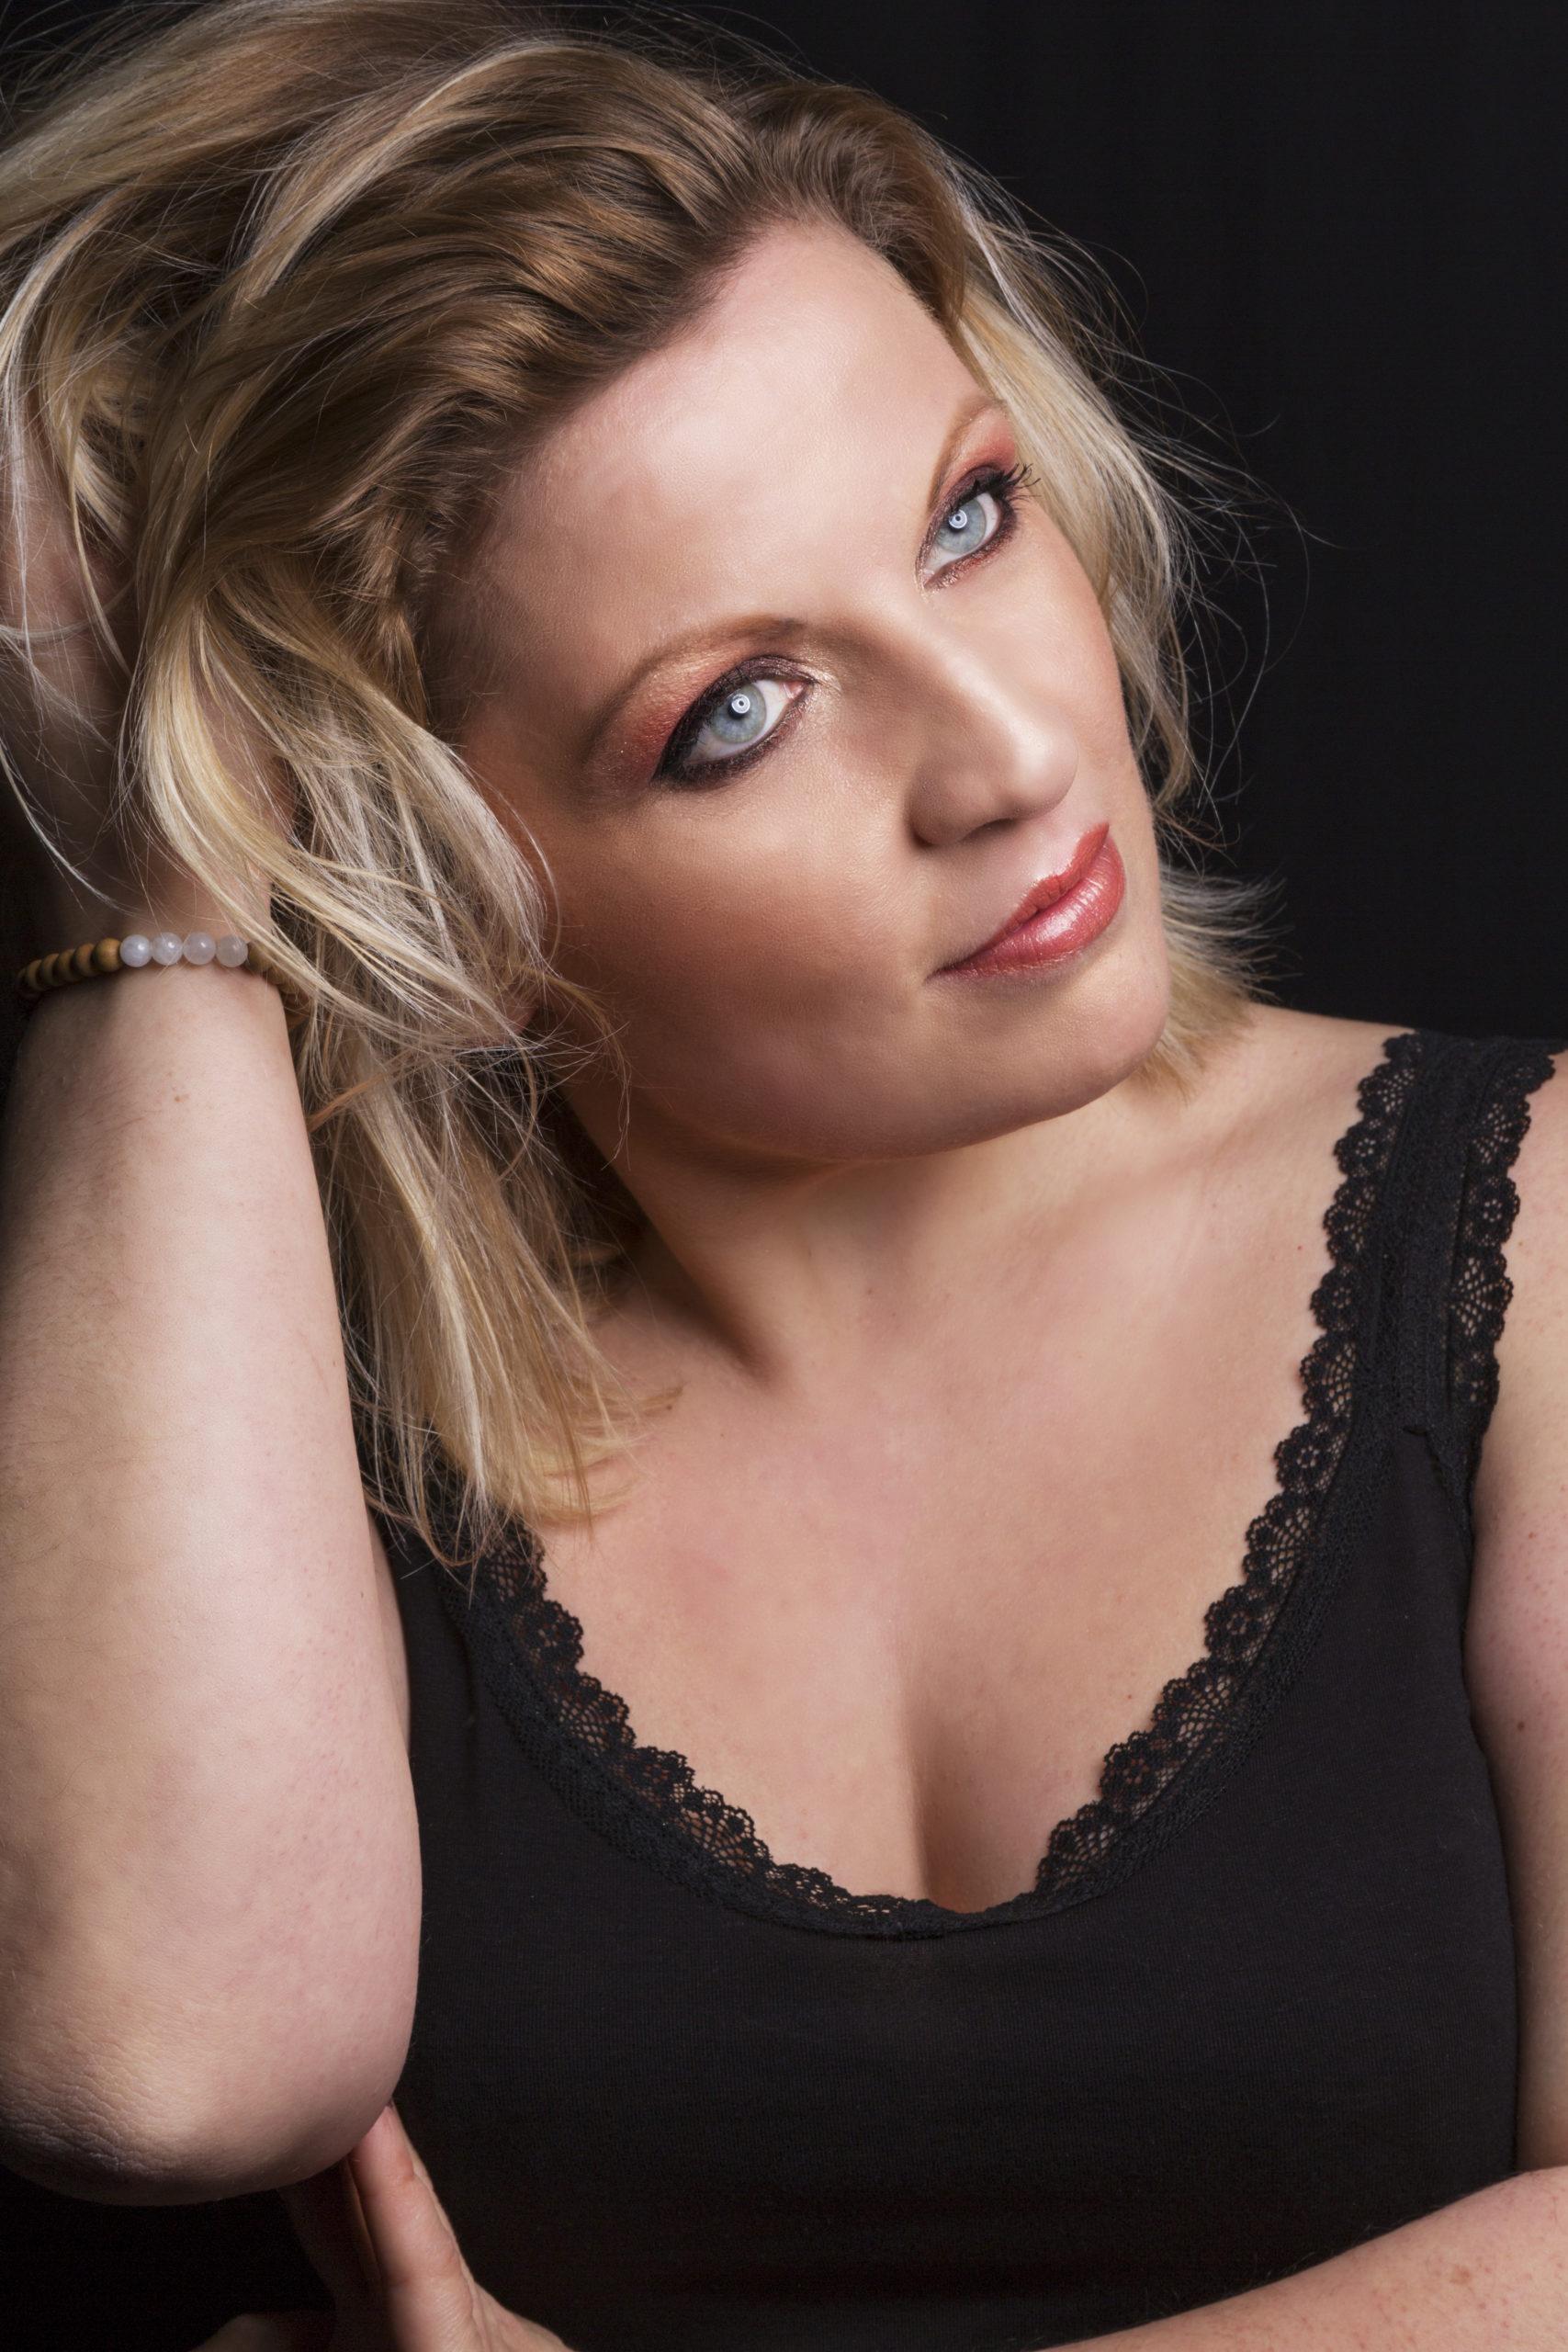 Lucile-Makeup-Pro-Laura-Cosentino-Matton-Photographe-HD (8)